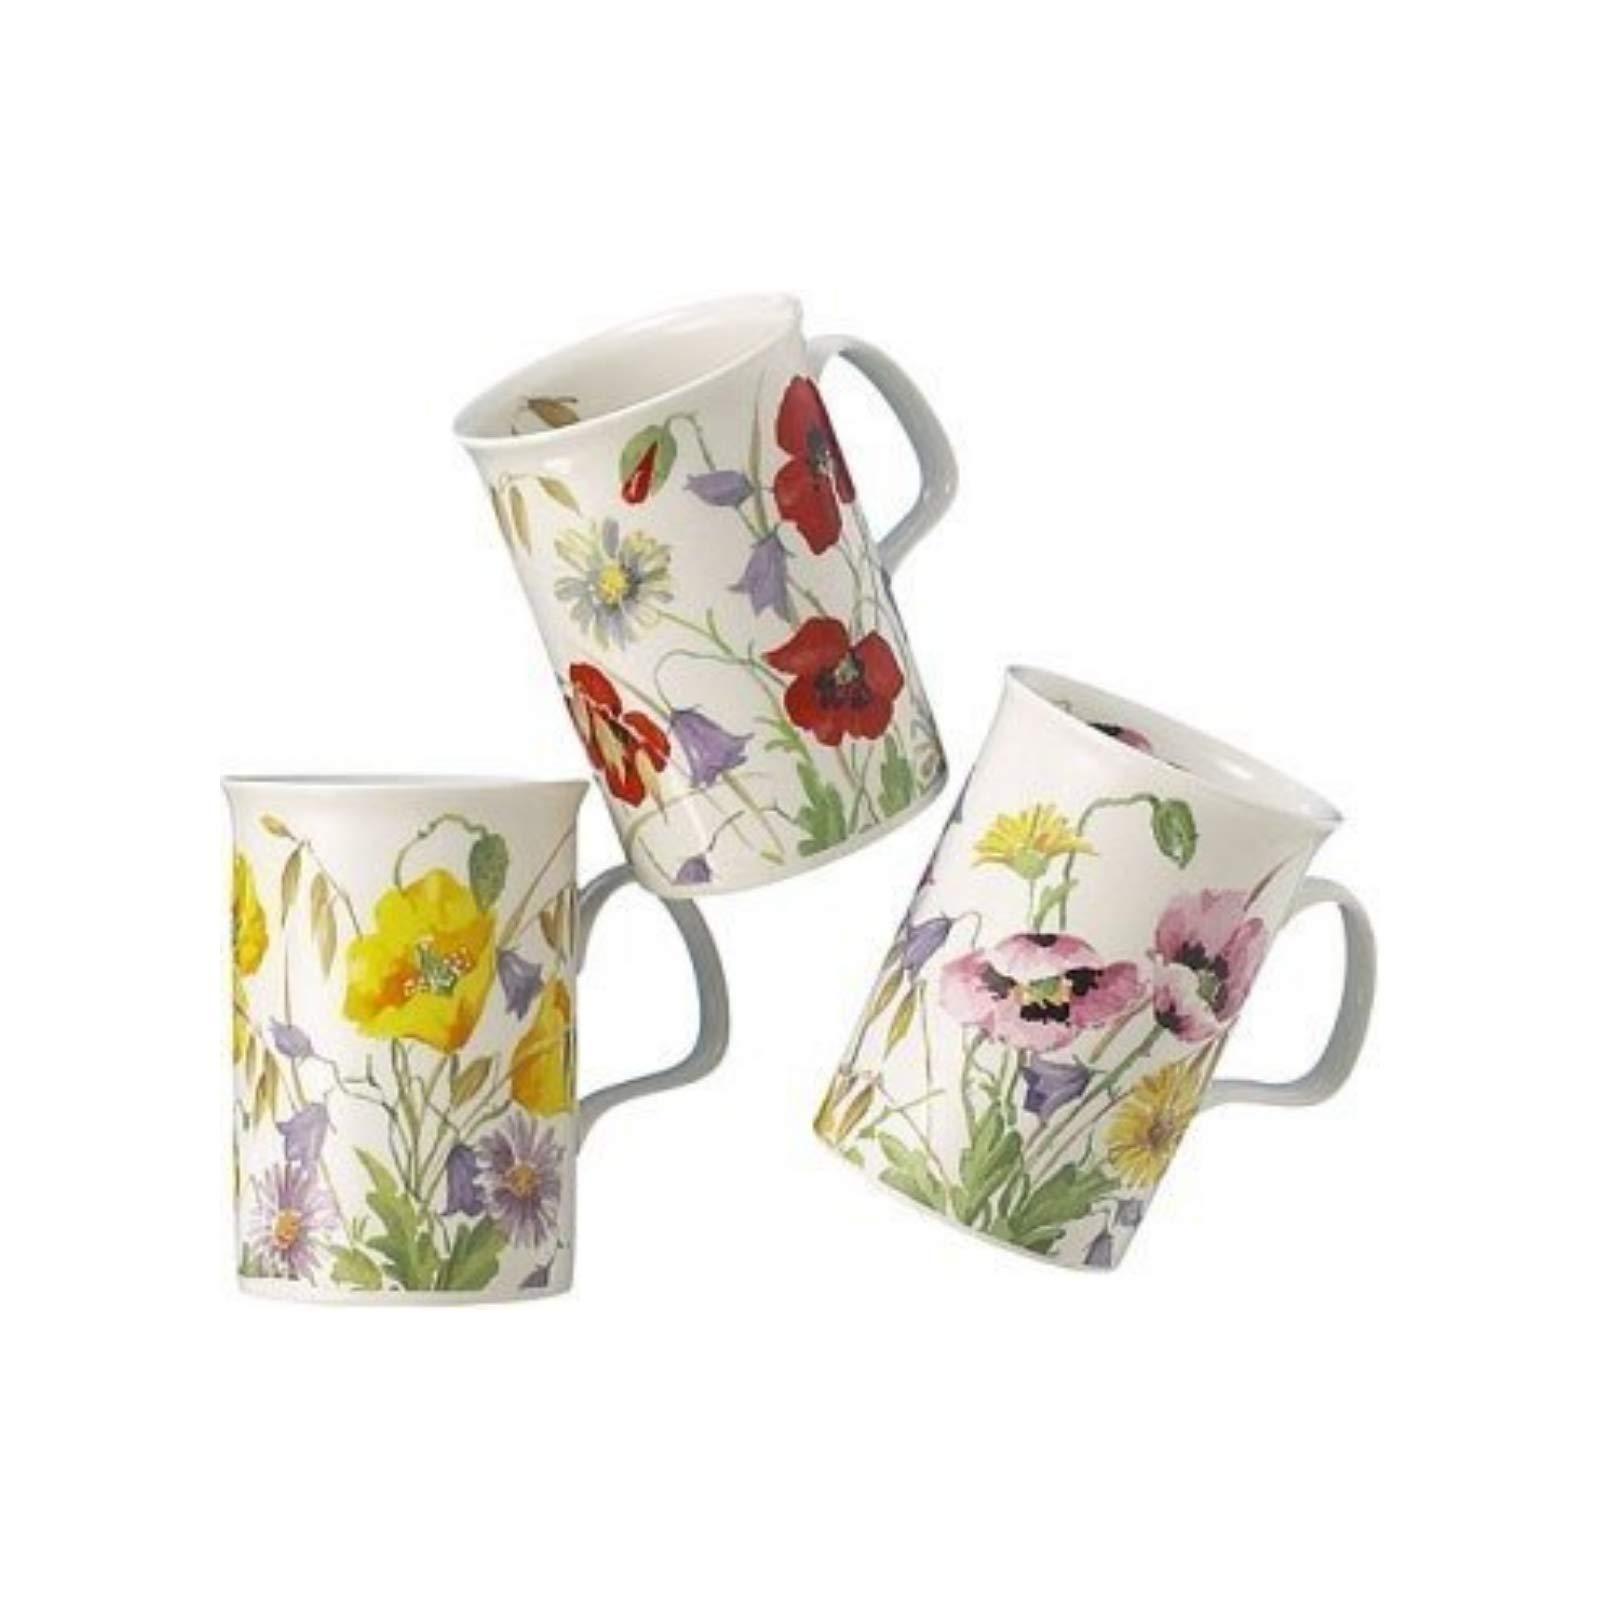 Roy Kirkham English Meadow Set Of Three Assorted Mugs